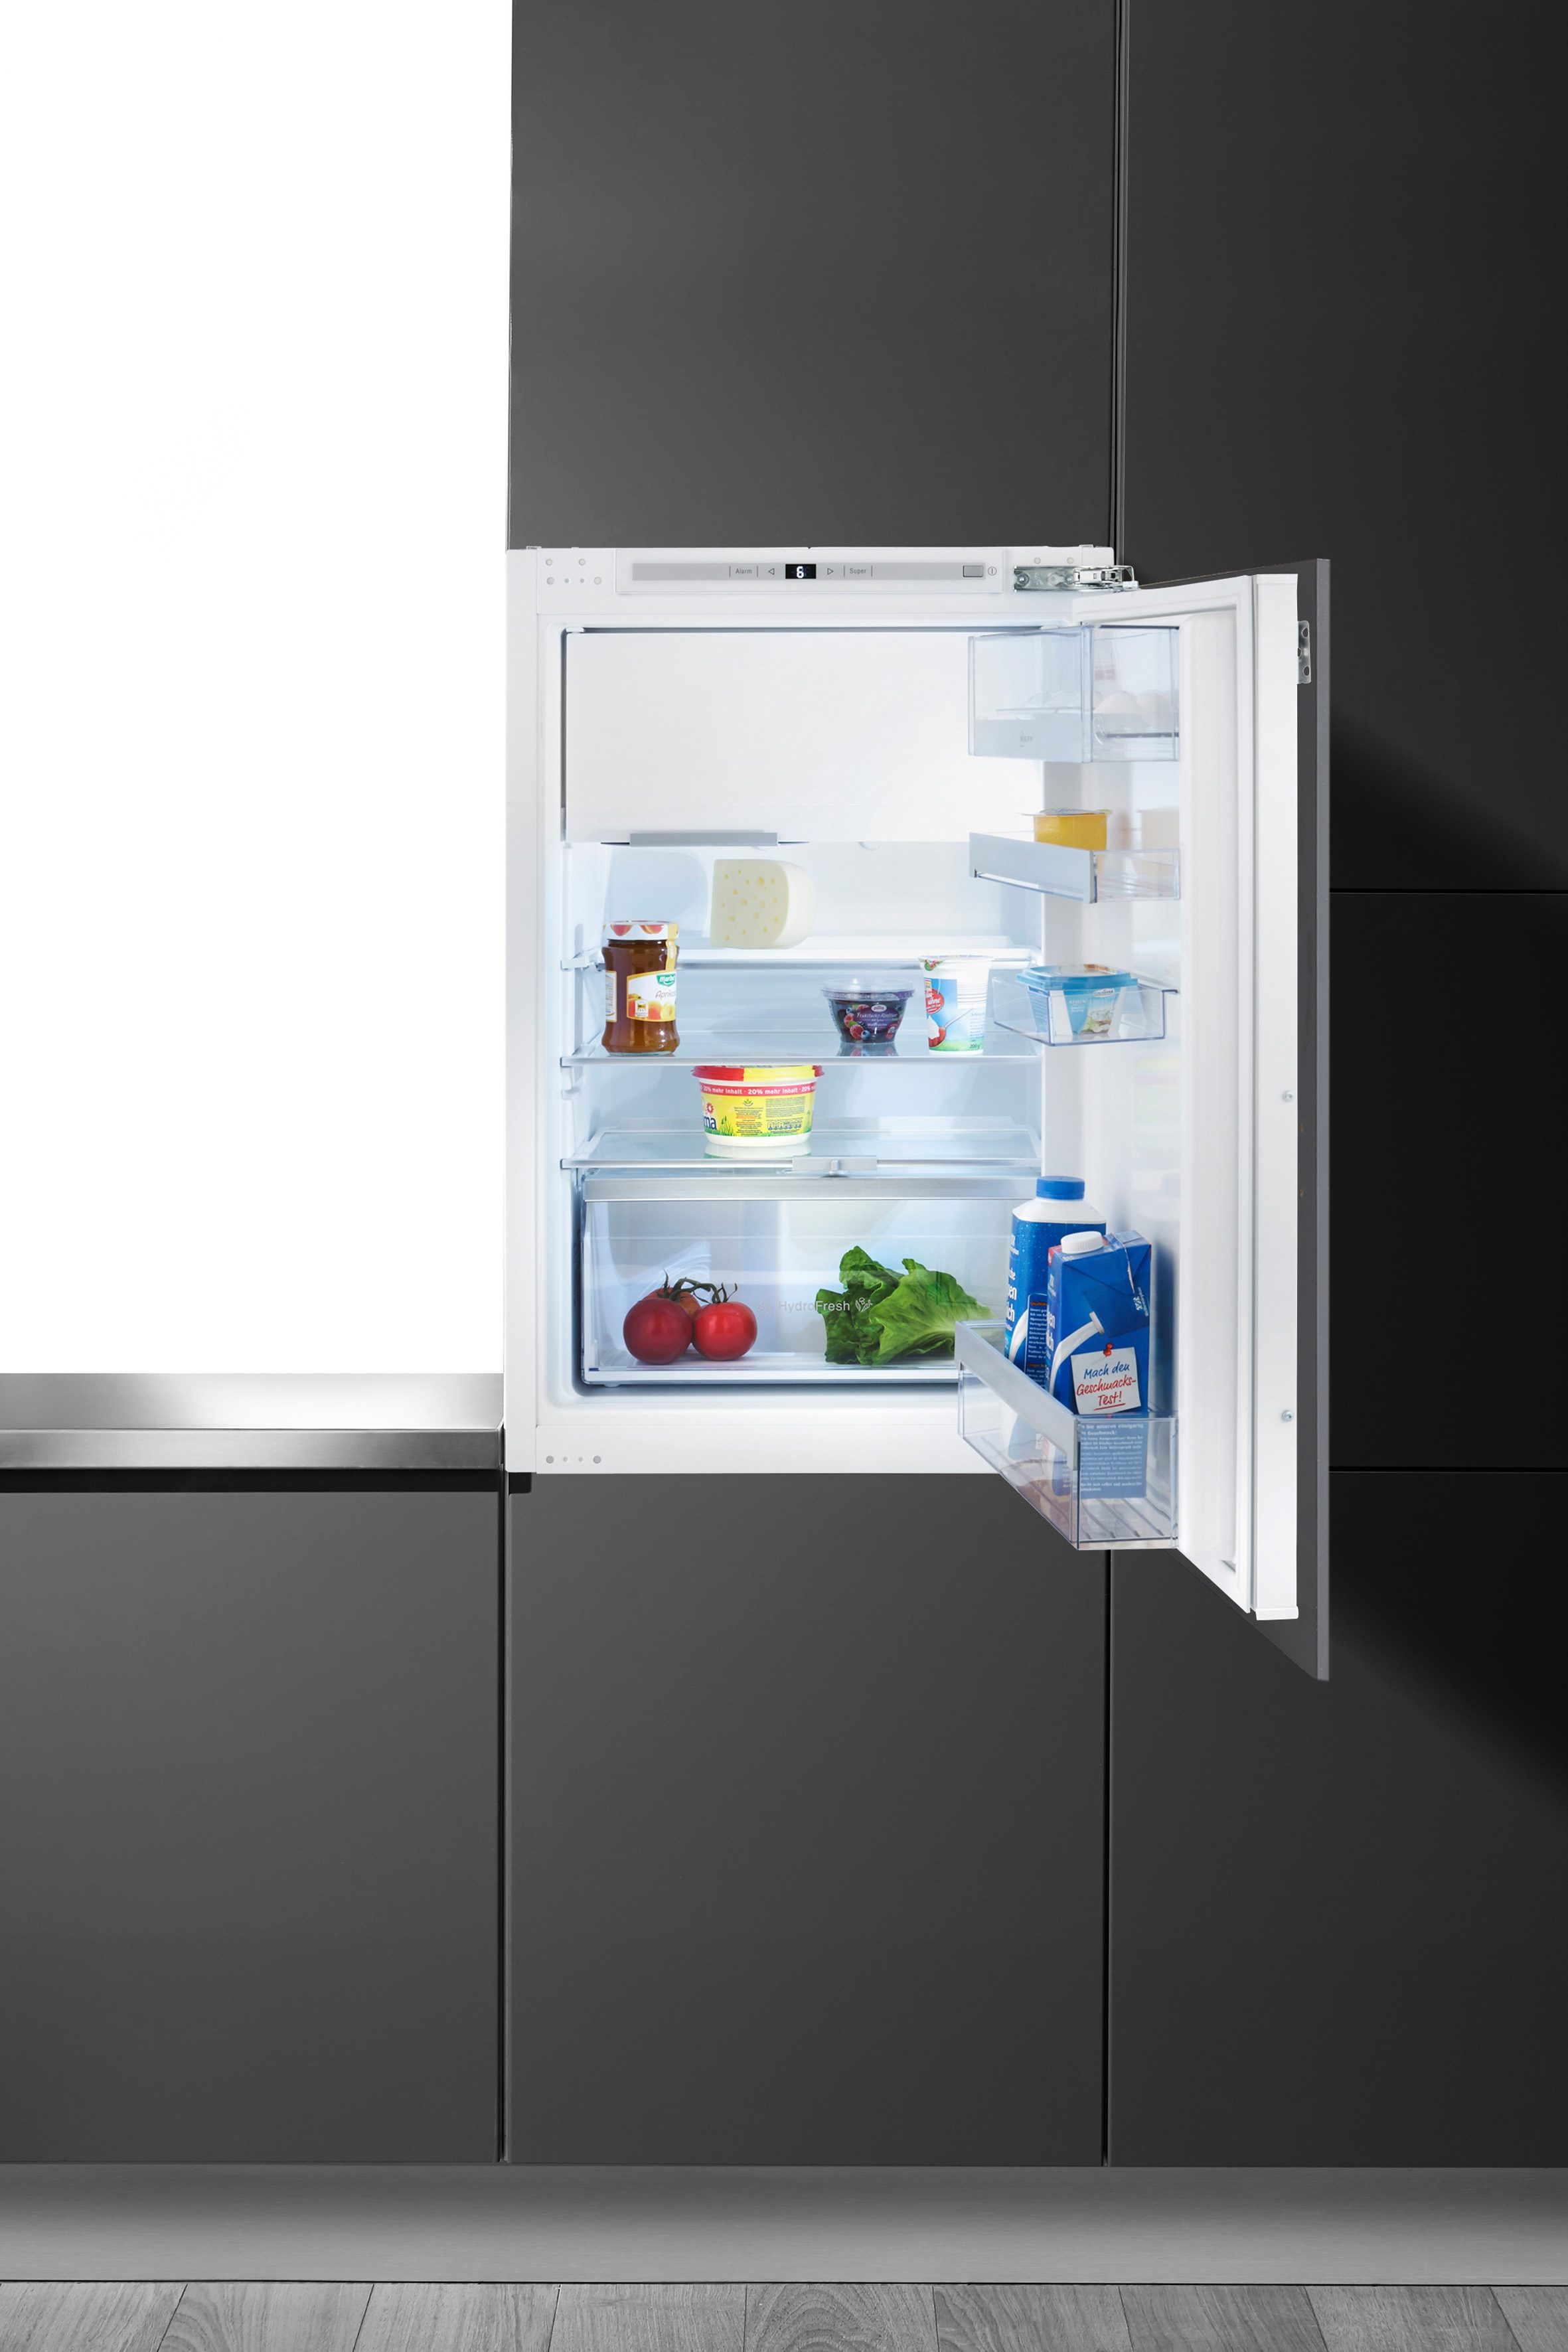 Neff Integrierbarer FreshSafe Einbaukühlschrank K 245 A2 /KI2223F30, A++, 87,4 cm